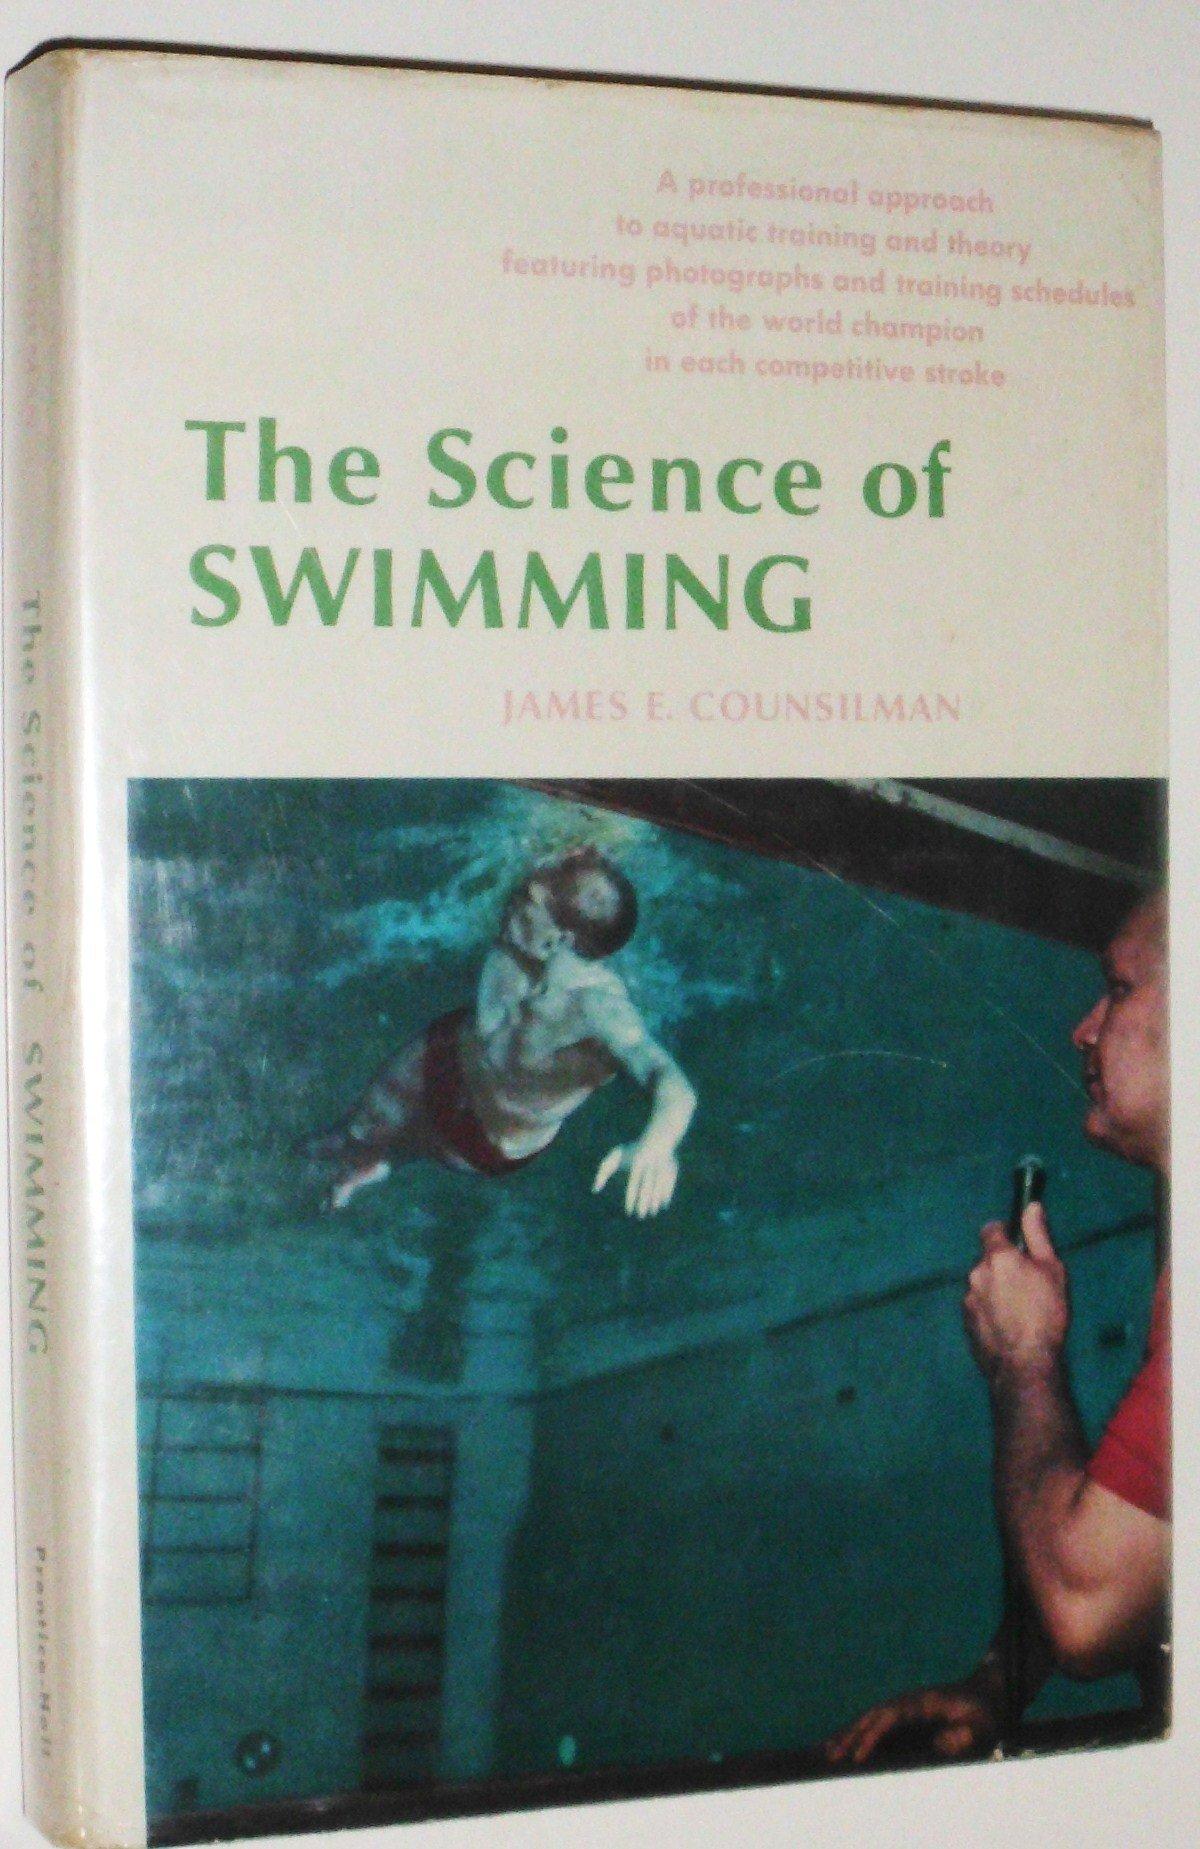 The Science of Swimming: James E. Counsilman: 9780137953851: Amazon.com:  Books